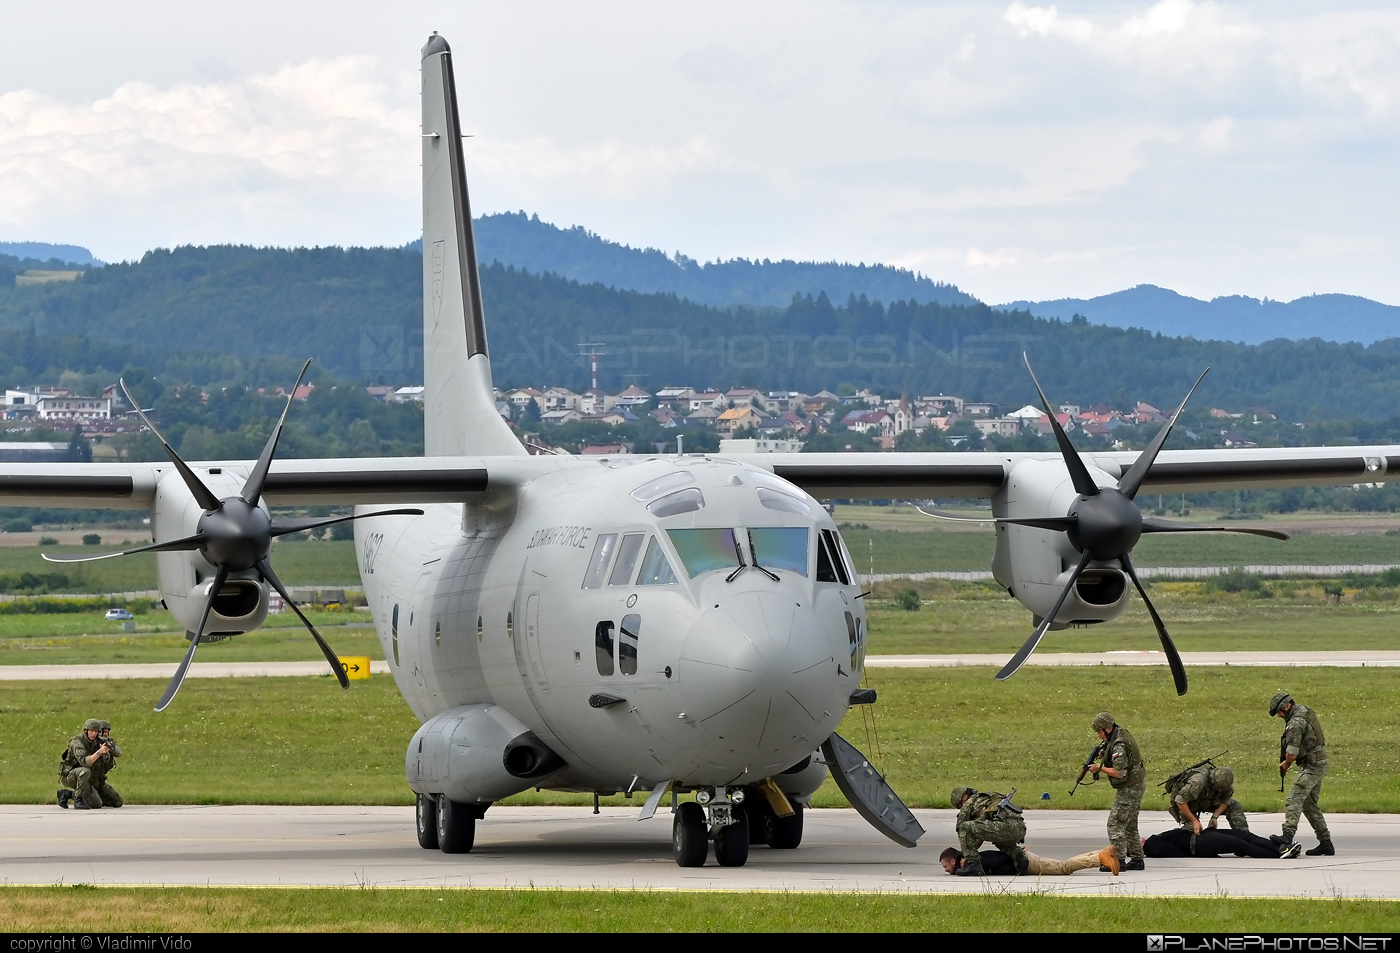 Leonardo C-27J Spartan - 1962 operated by Vzdušné sily OS SR (Slovak Air Force) #c27j #c27jspartan #c27spartan #leonardo #leonardo27j #leonardoc27jspartan #leonardospartan #slovakairforce #vzdusnesilyossr